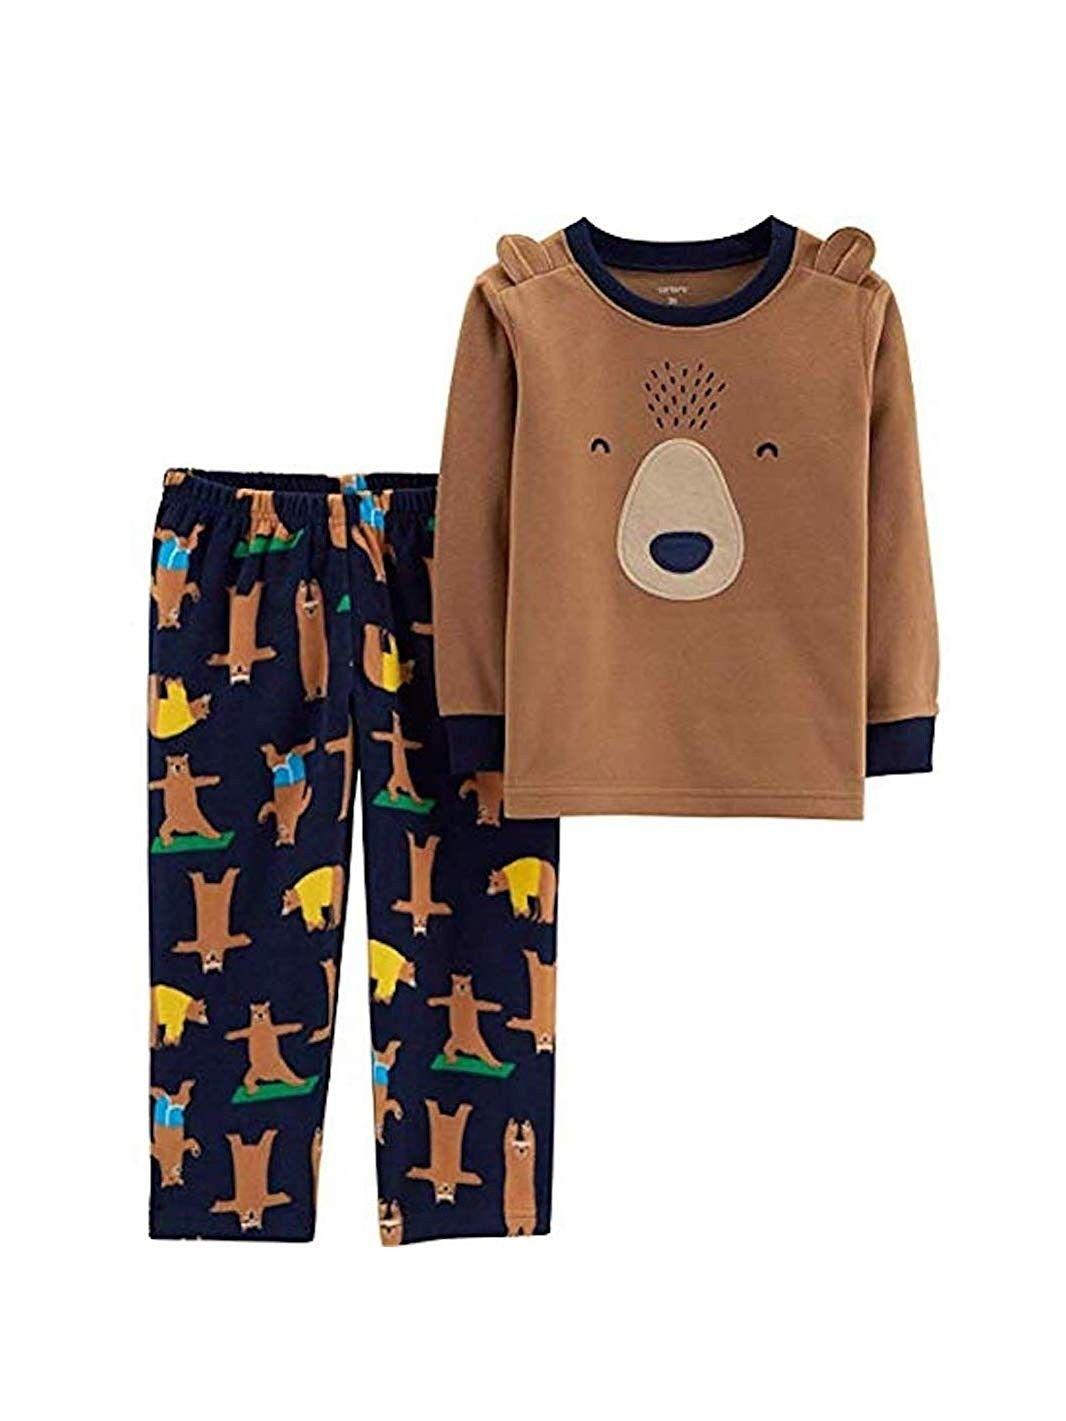 Boys' 2-Piece Fleece Pajama Set - Brown Bear (Brown/Blue) - C418M8K2TU5 | Boys  pajamas, Baby pajamas, Pajama set